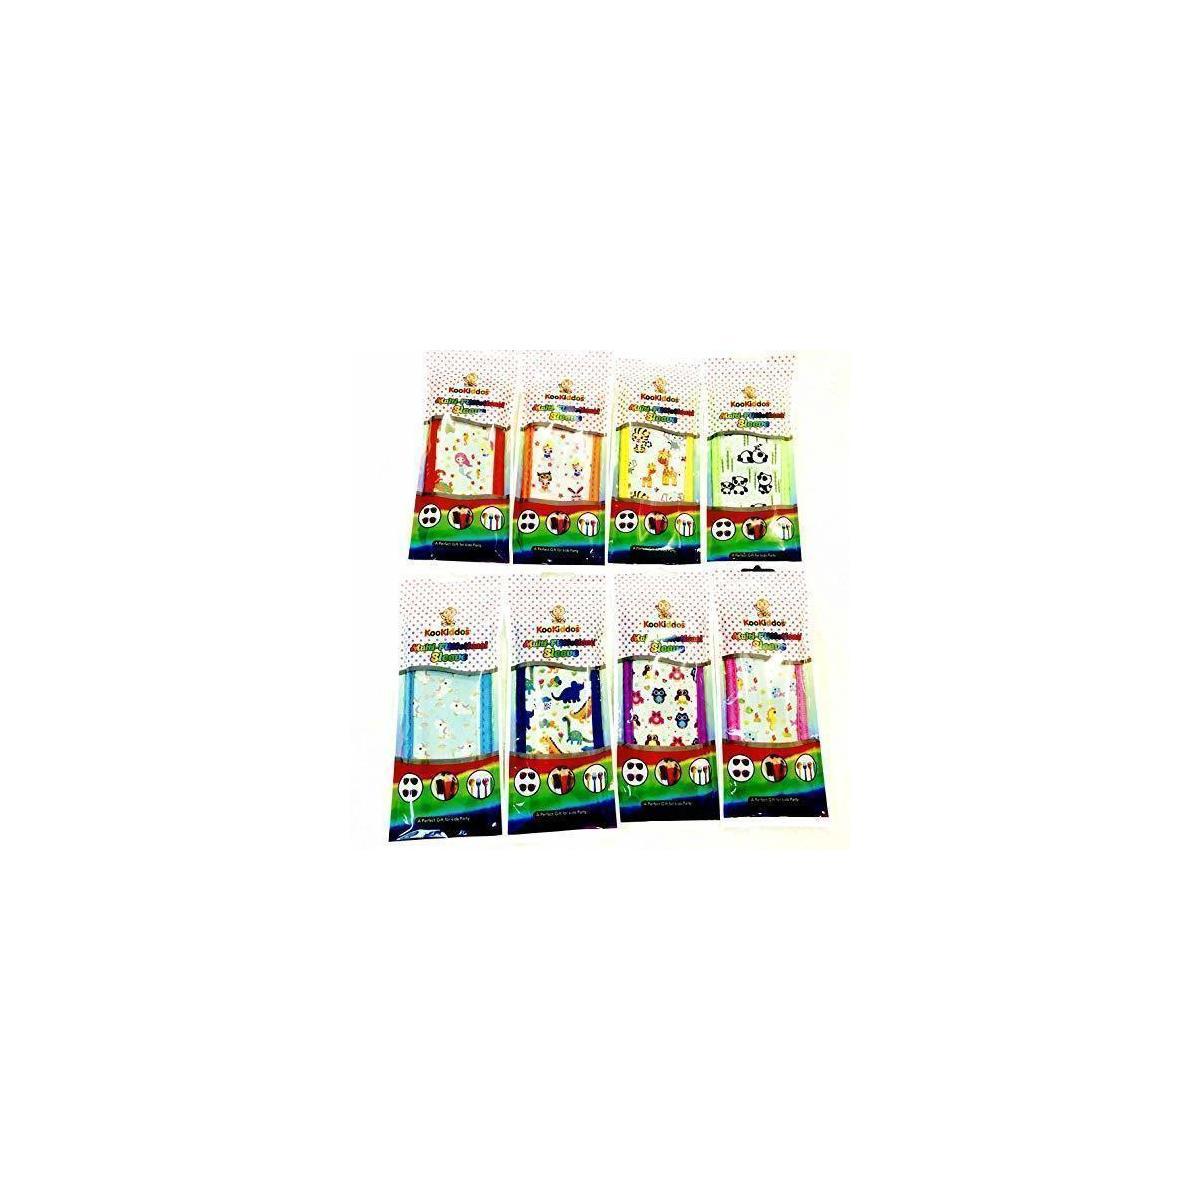 KooKiddos Ice Pop Sleeves, Popsicle Holders For Kids, Reusable Popsicles Covers, Neoprene Storage Popsicle Bags, Freeze Pops Sleeve, Freezer Pops Ice Pops Insulator, Popsicle Holder Pack of 8 Designs